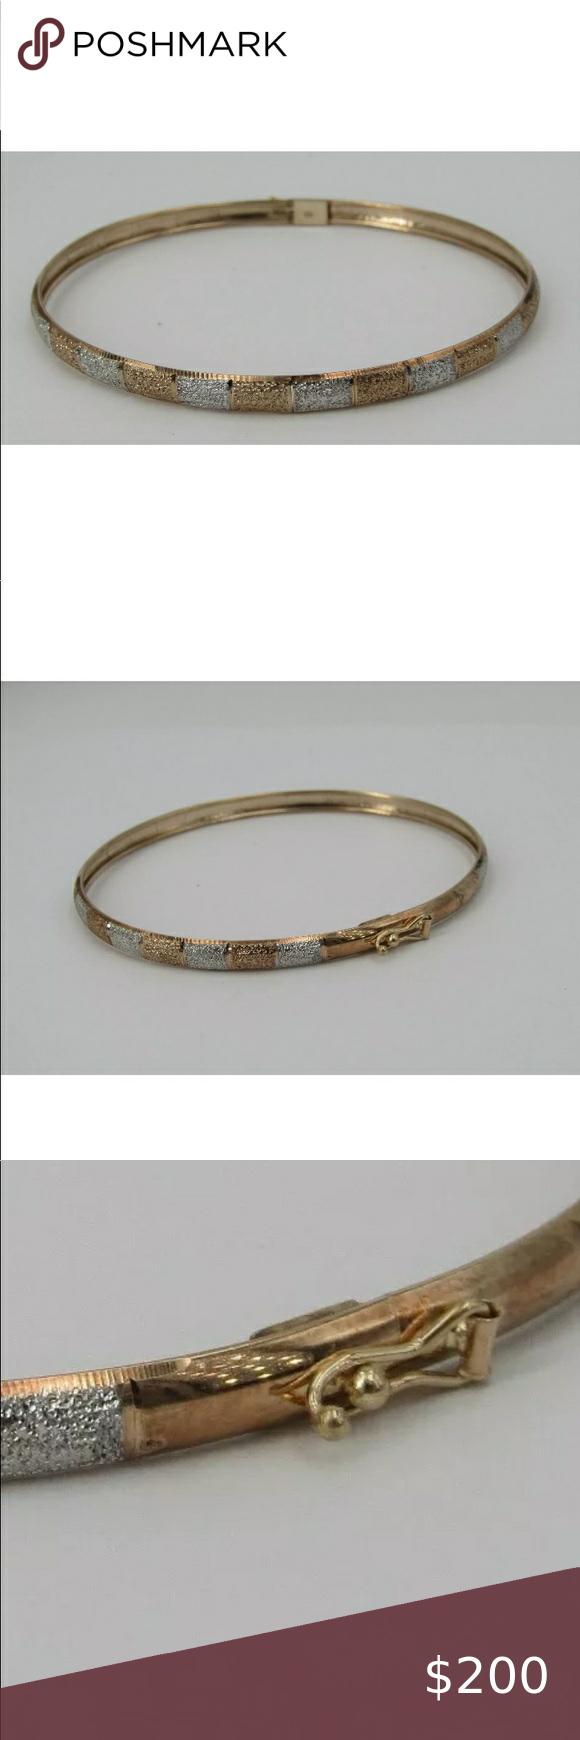 10 Karat Gold Bangle Bracelet 10k Yellow White Gold 7 Textured Flex Bangle Bracelet Weighs 3 30 Grams In 2020 Gold Bangle Bracelet Gold Bangles Bangle Bracelets